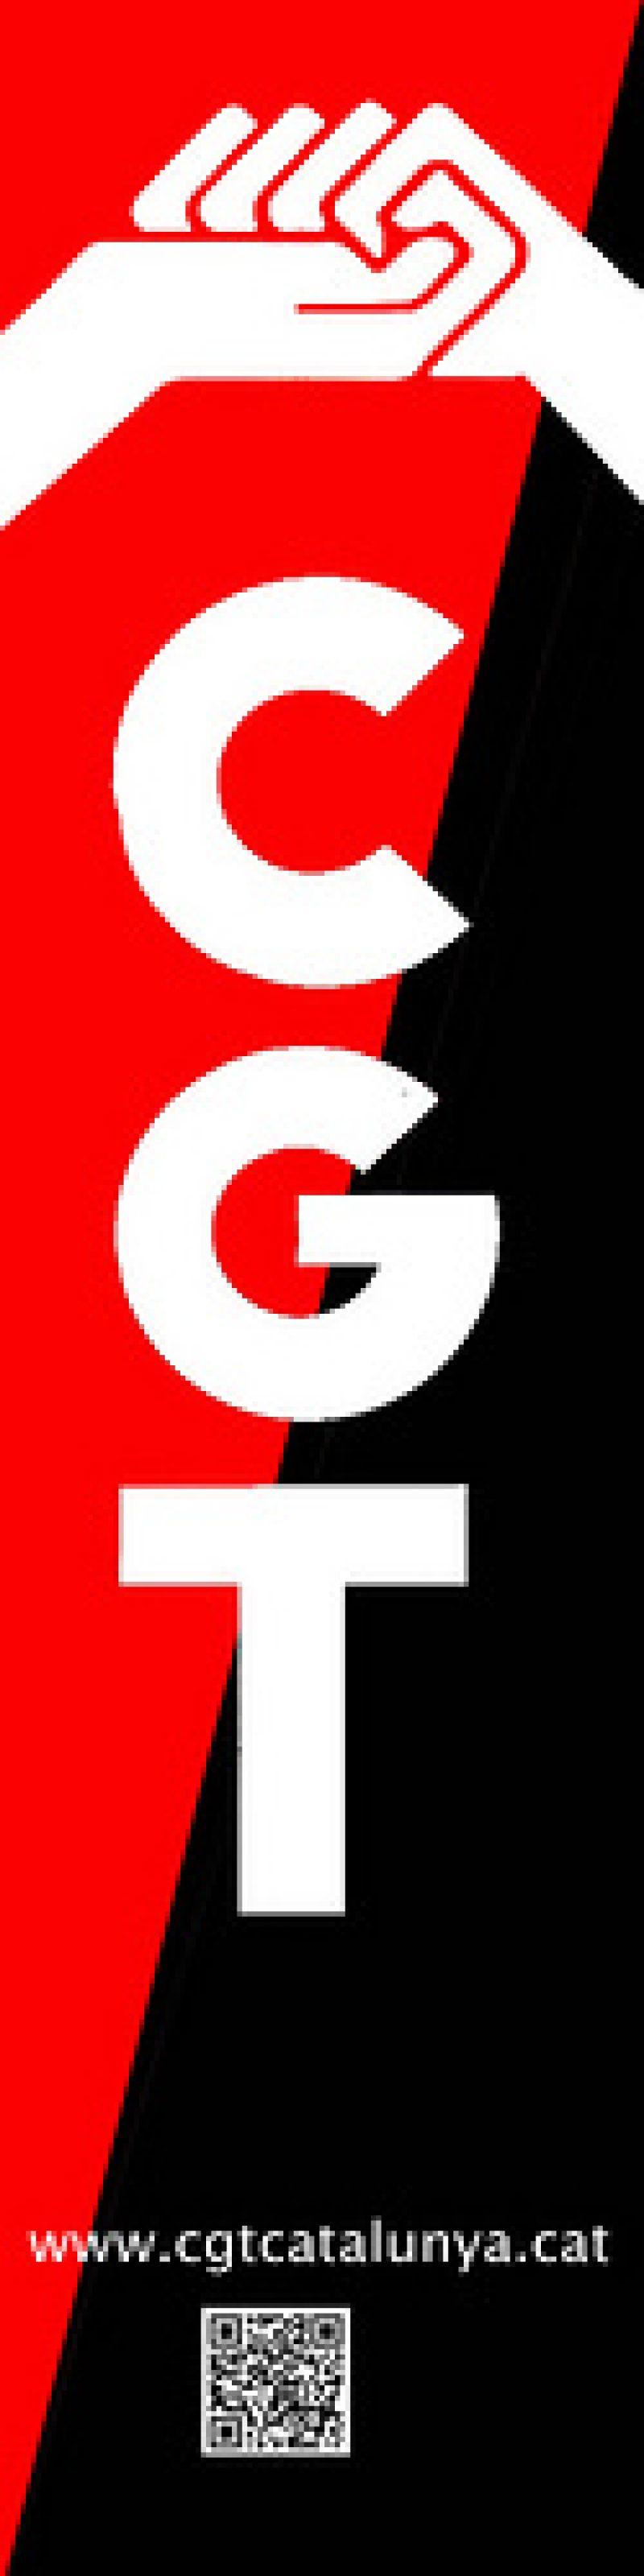 Logos CGT (baja/media resolución) - Imagen-23